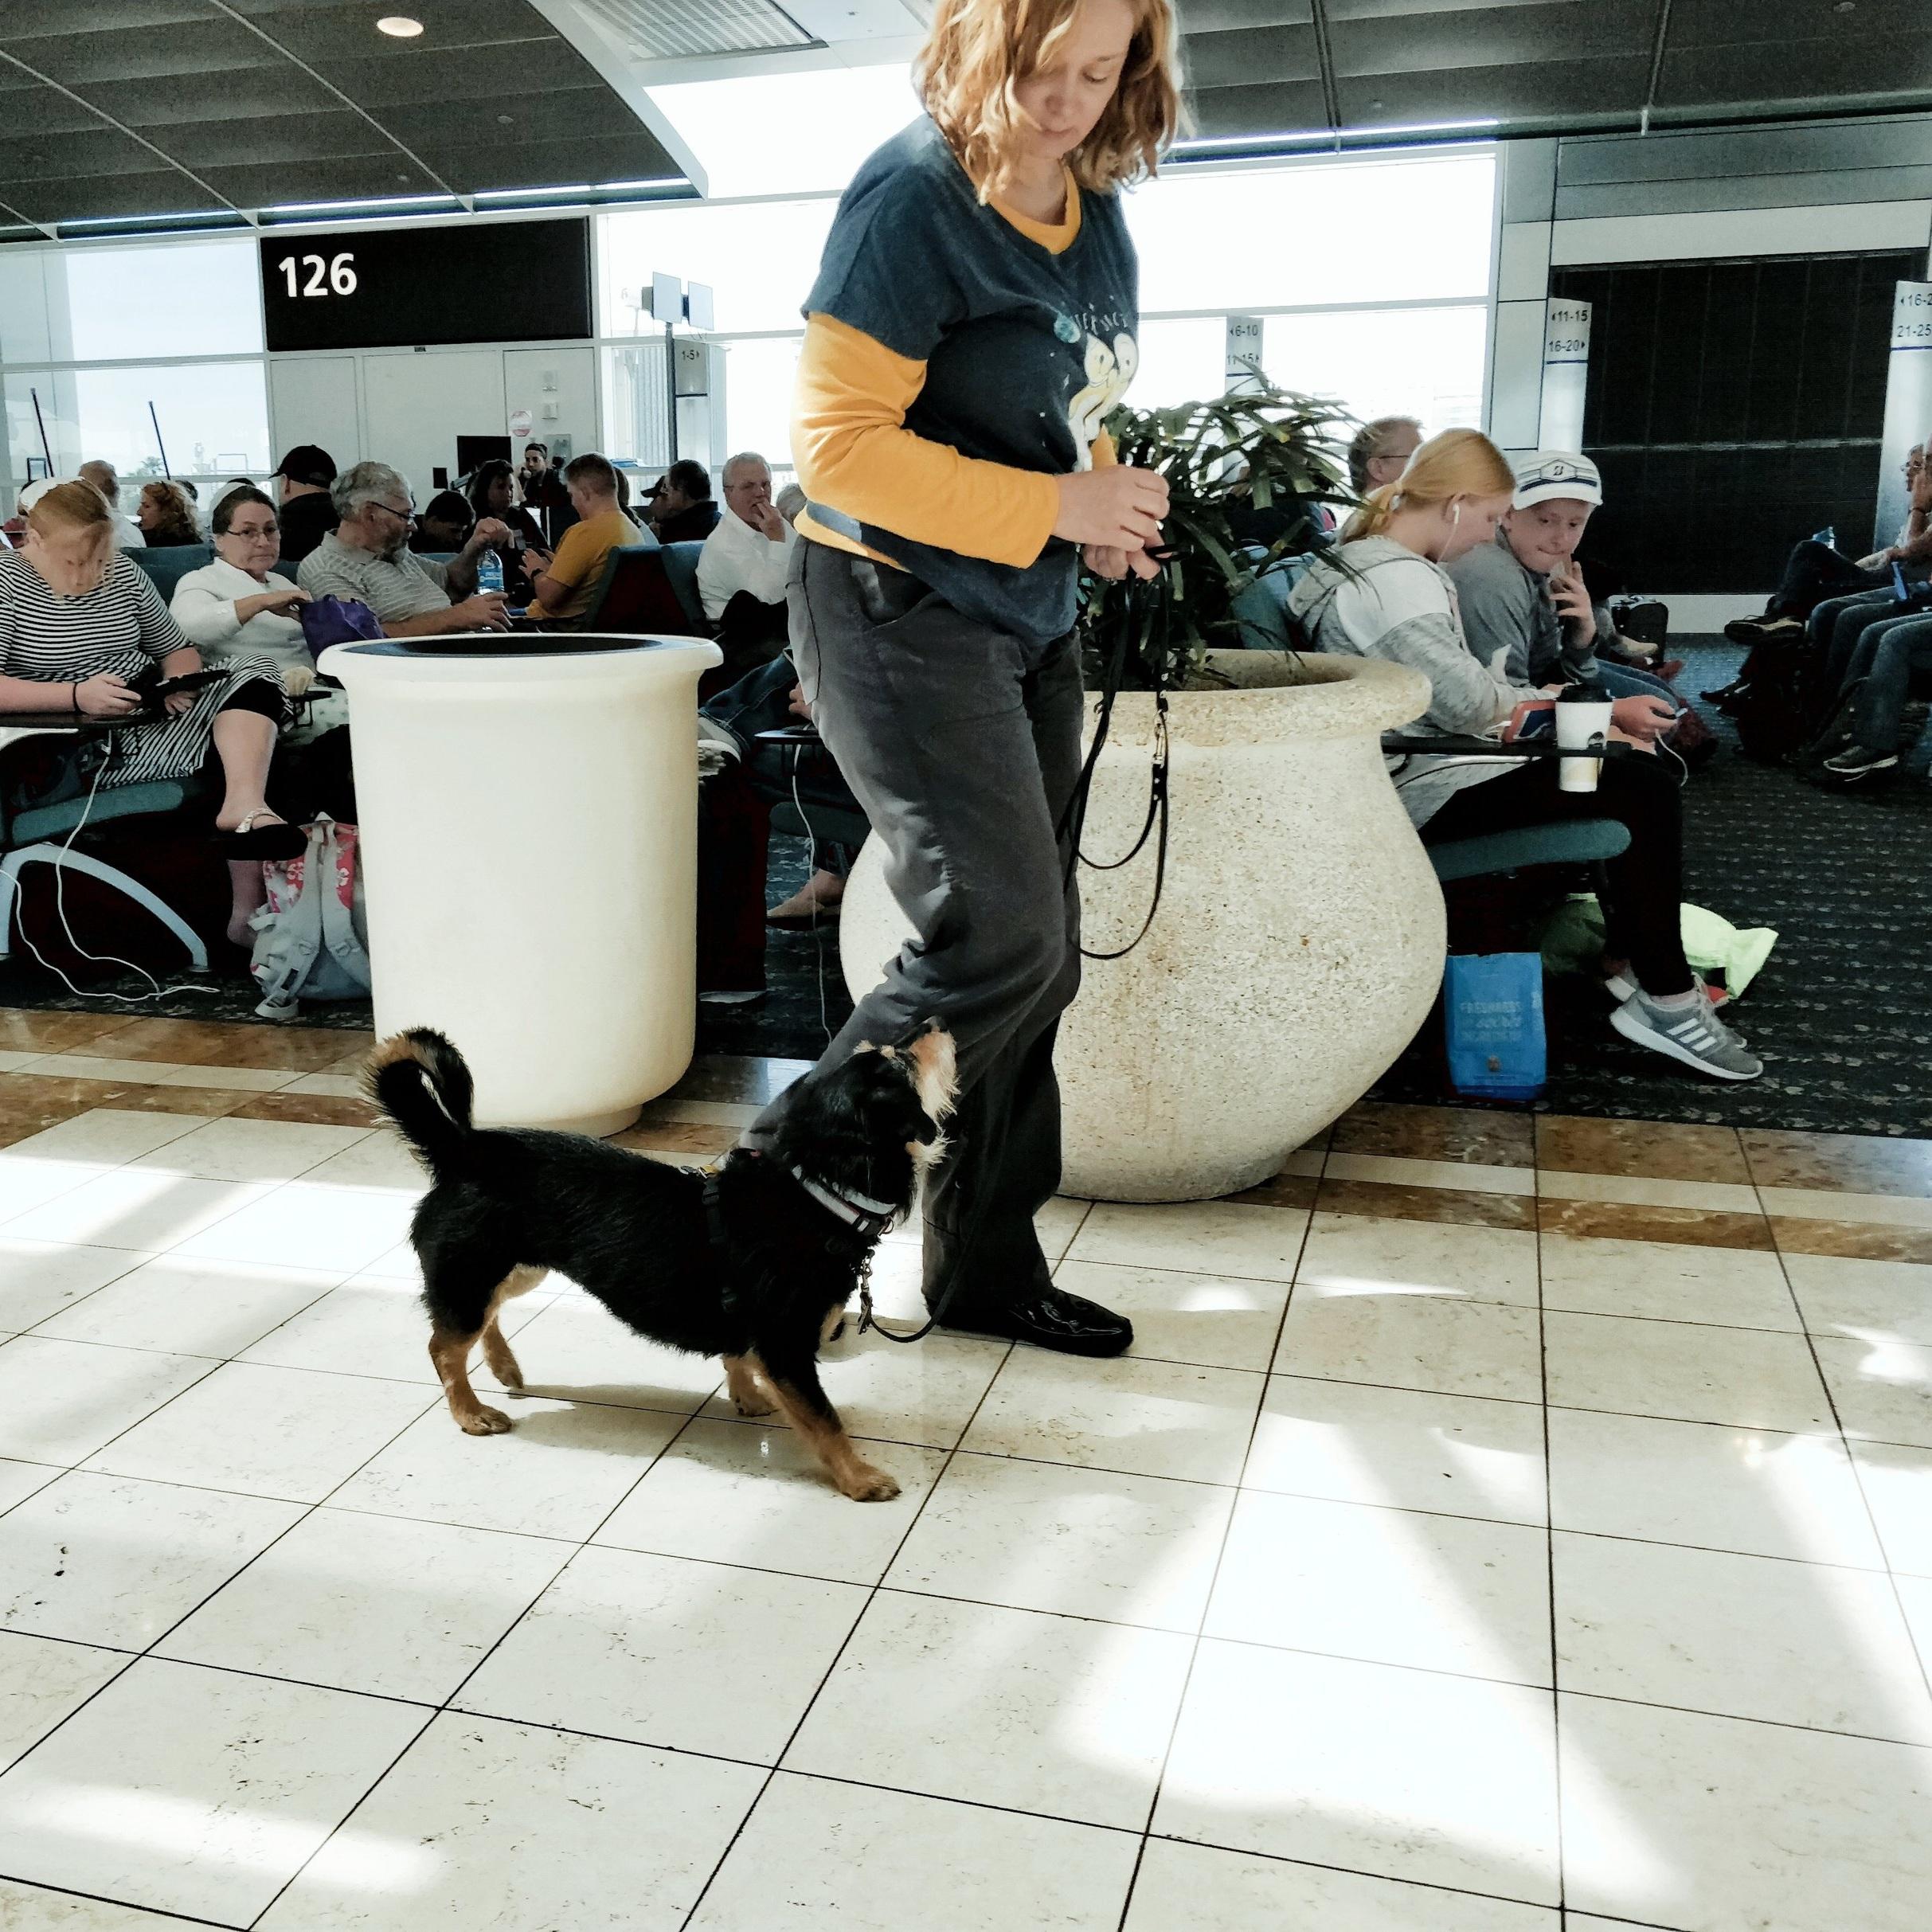 Aero walking through the airport